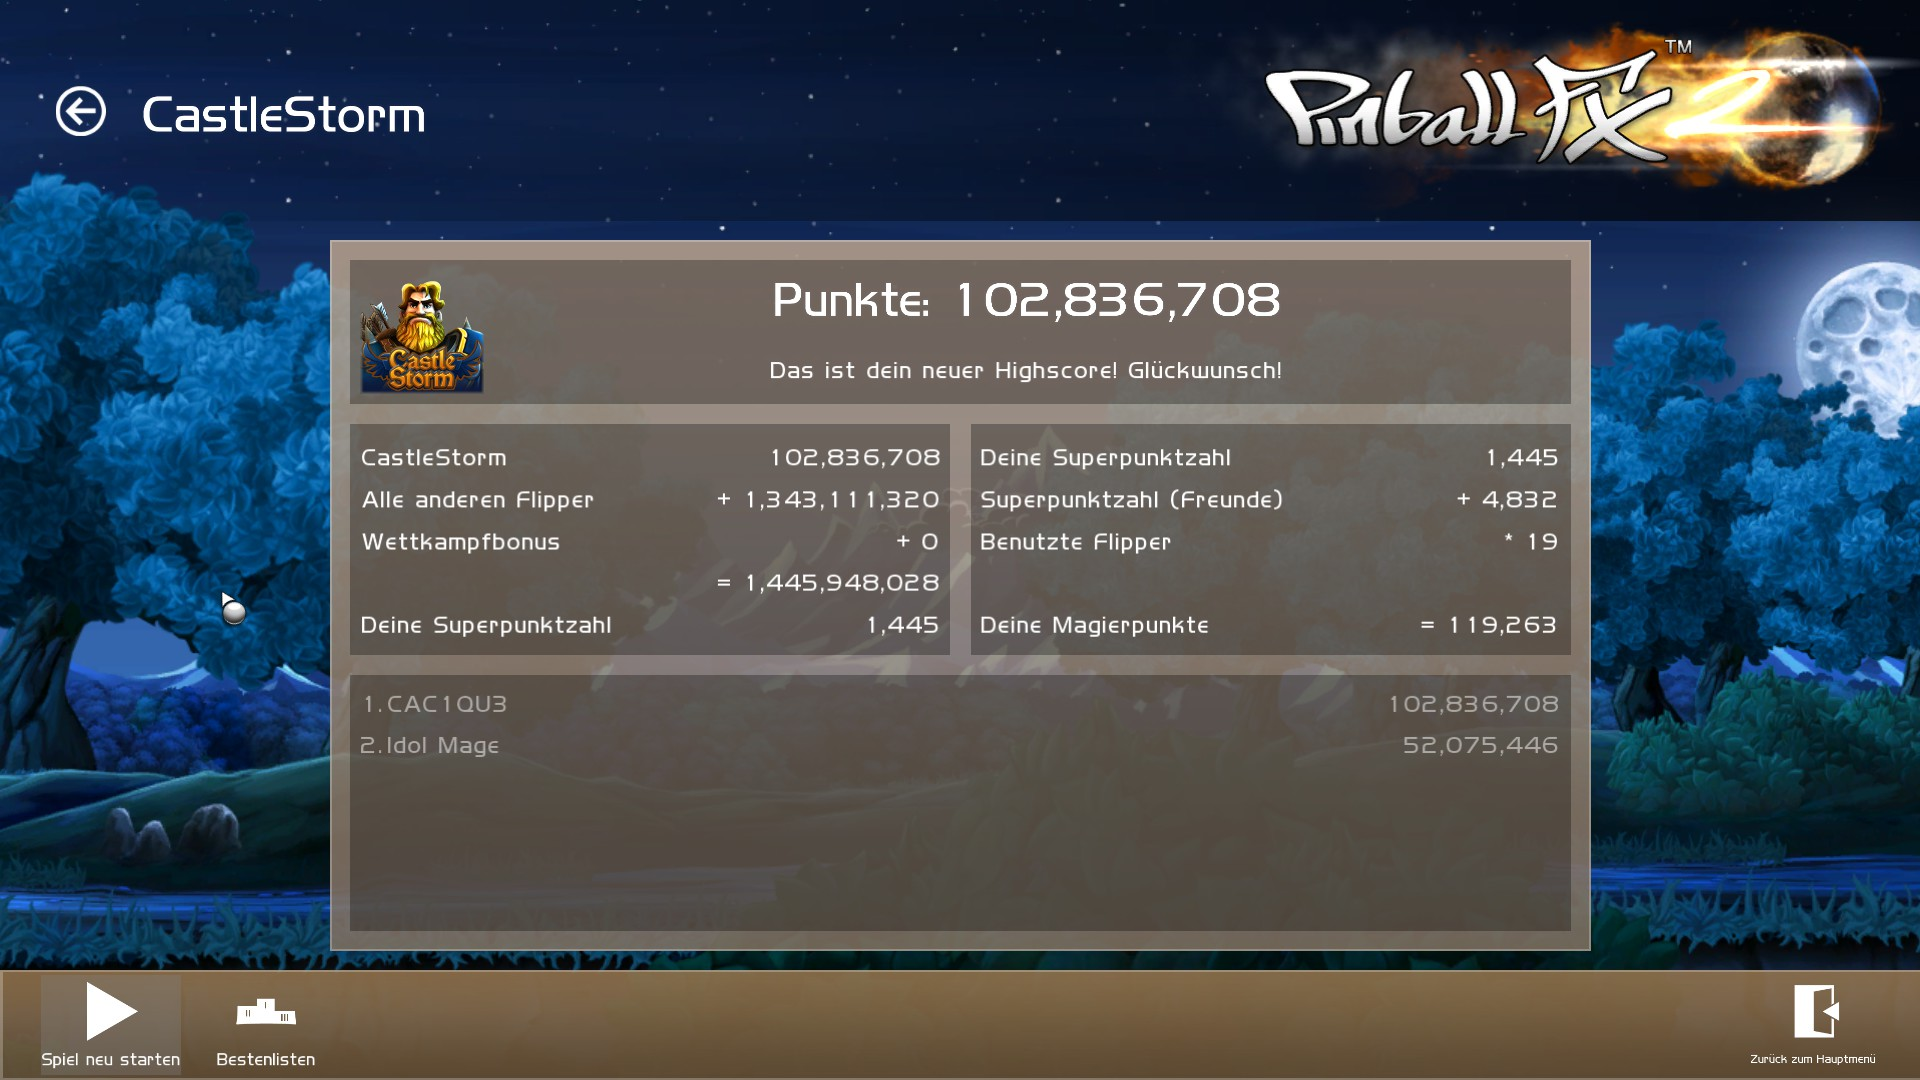 Pinball FX2: Castle Storm 102,836,708 points